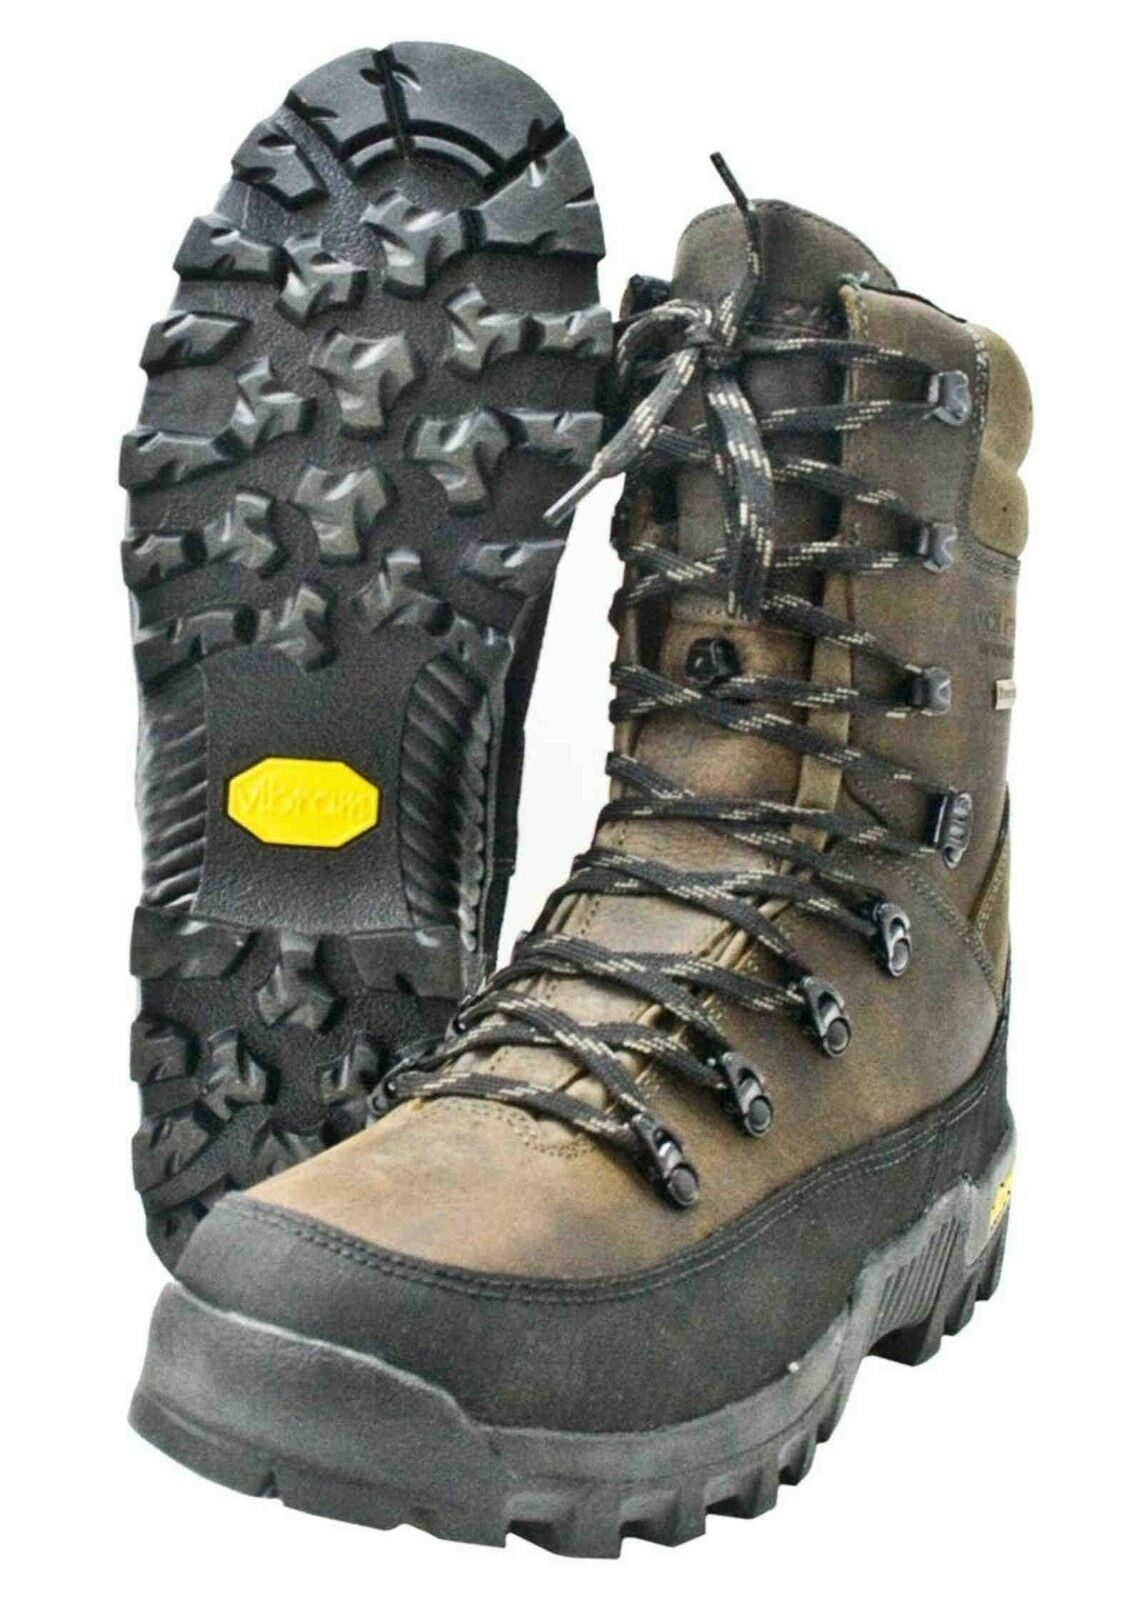 Jack Pyke Hunters botas De Cuero Impermeable botas De Tiro Caza fieldsman